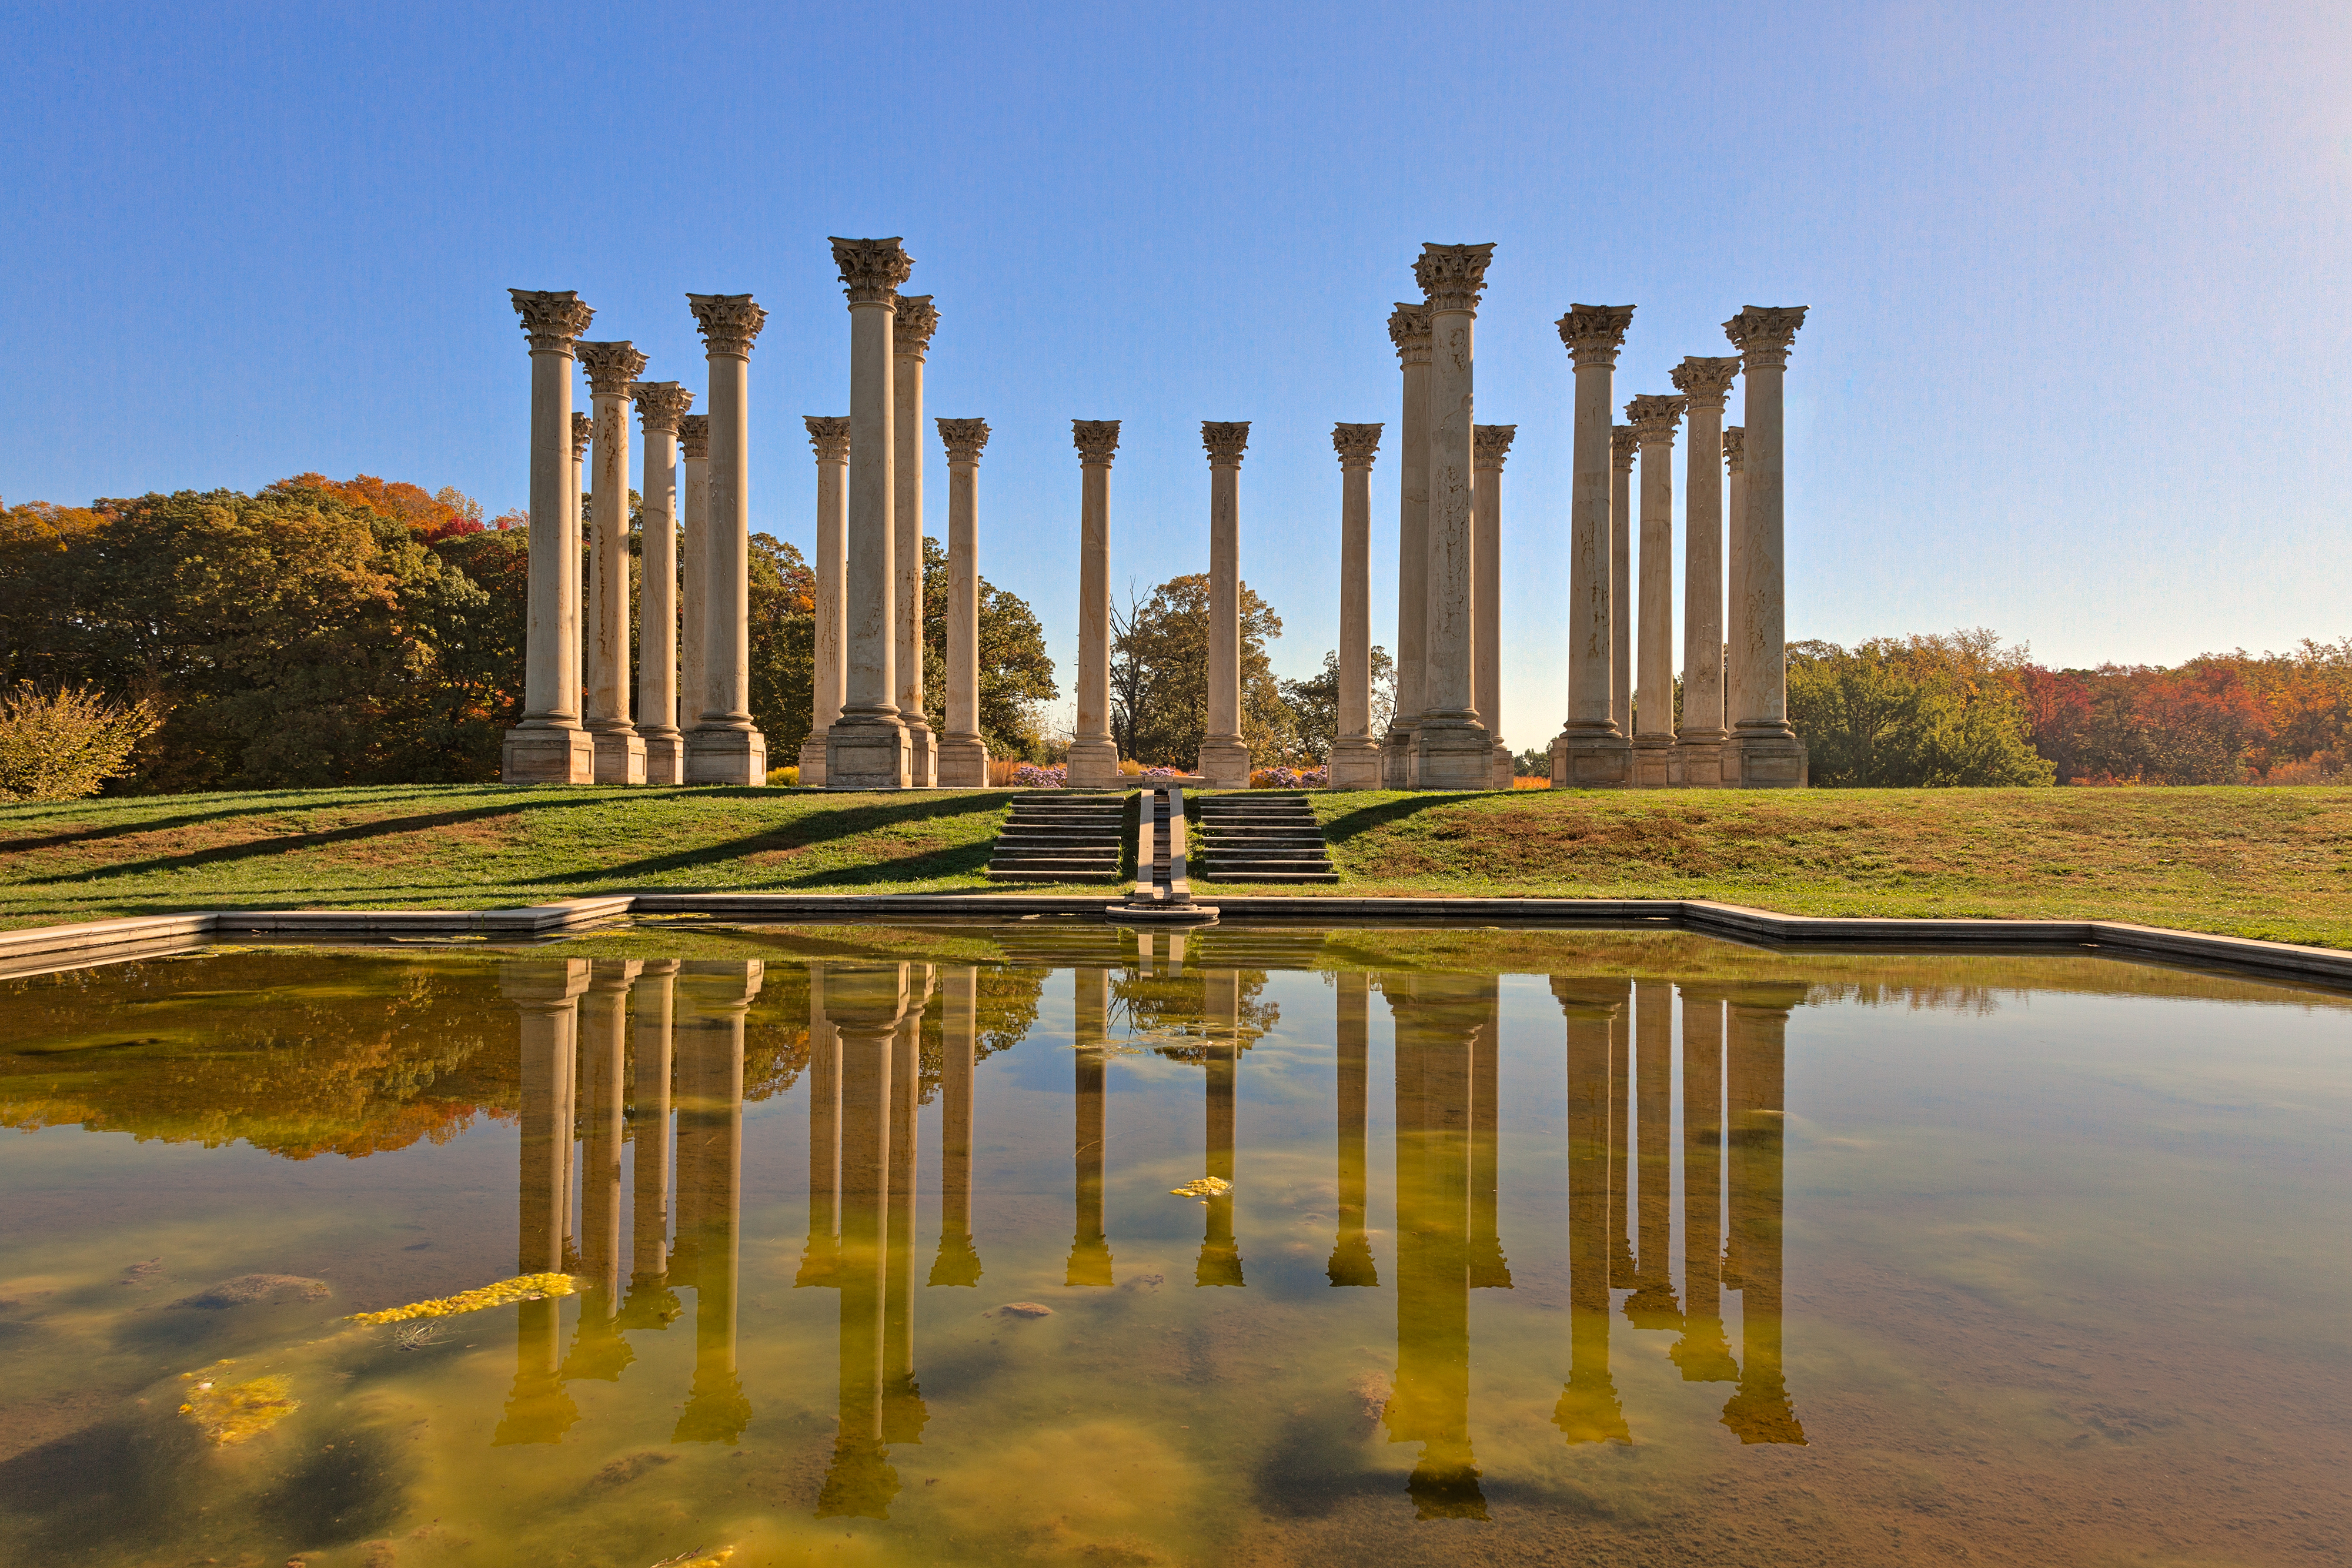 Capitol arboretum columns iii freebie by somadjinn on for Premade columns